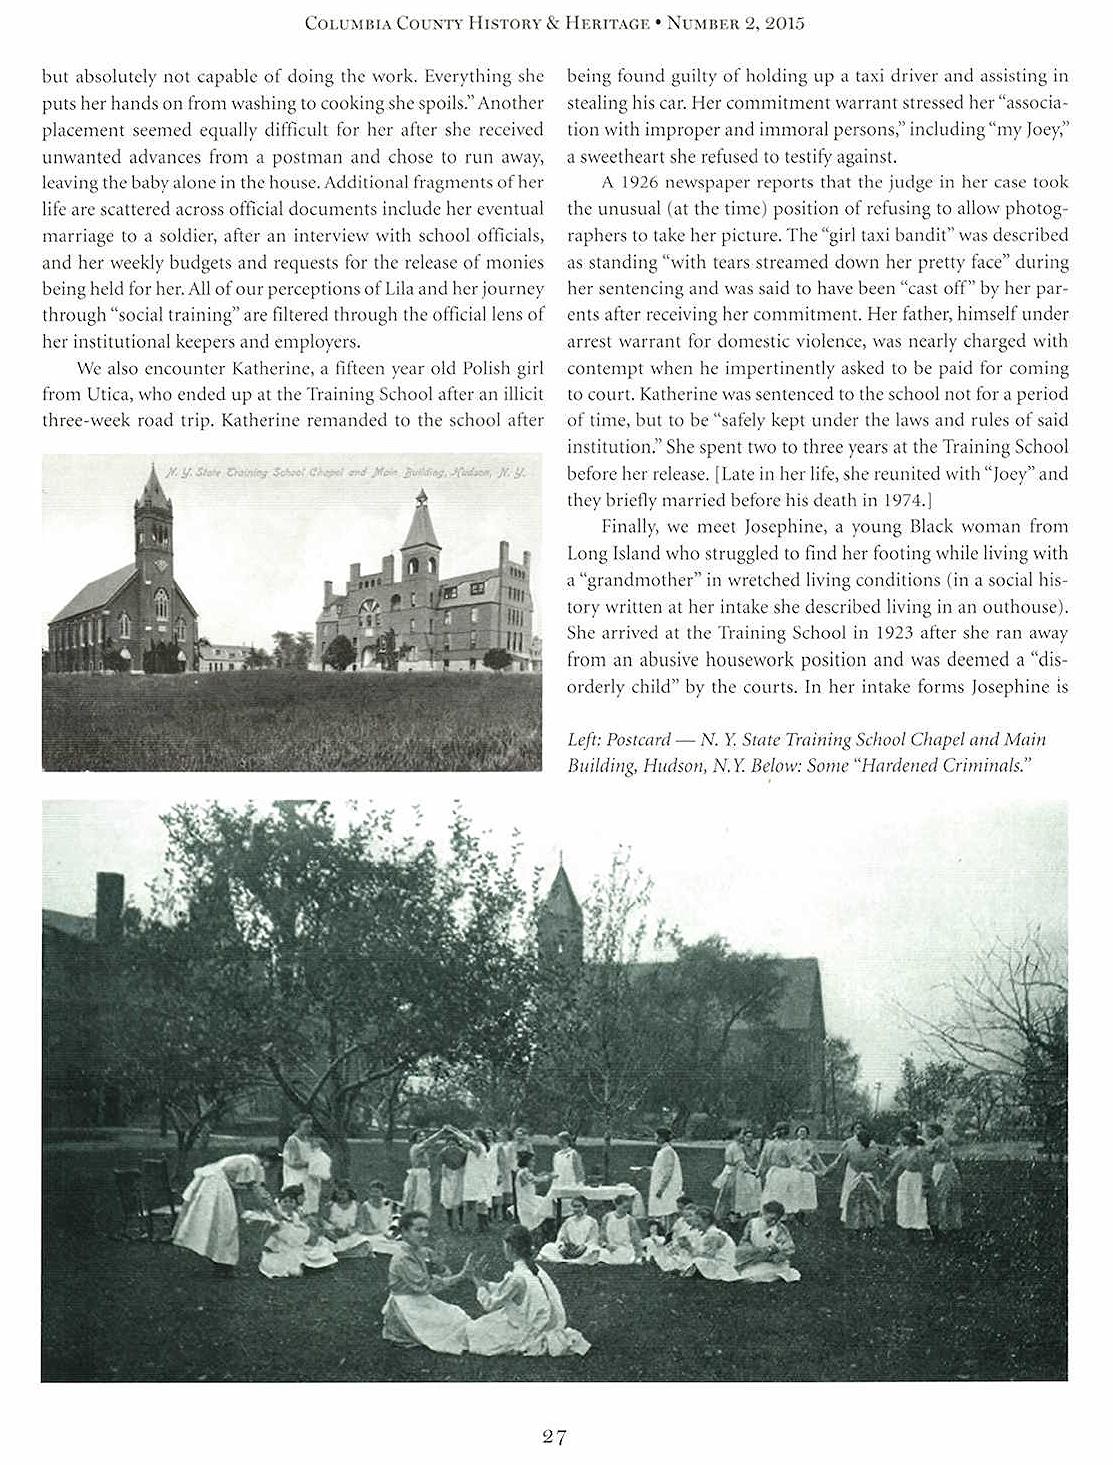 CoCo-historical-society2.JPG